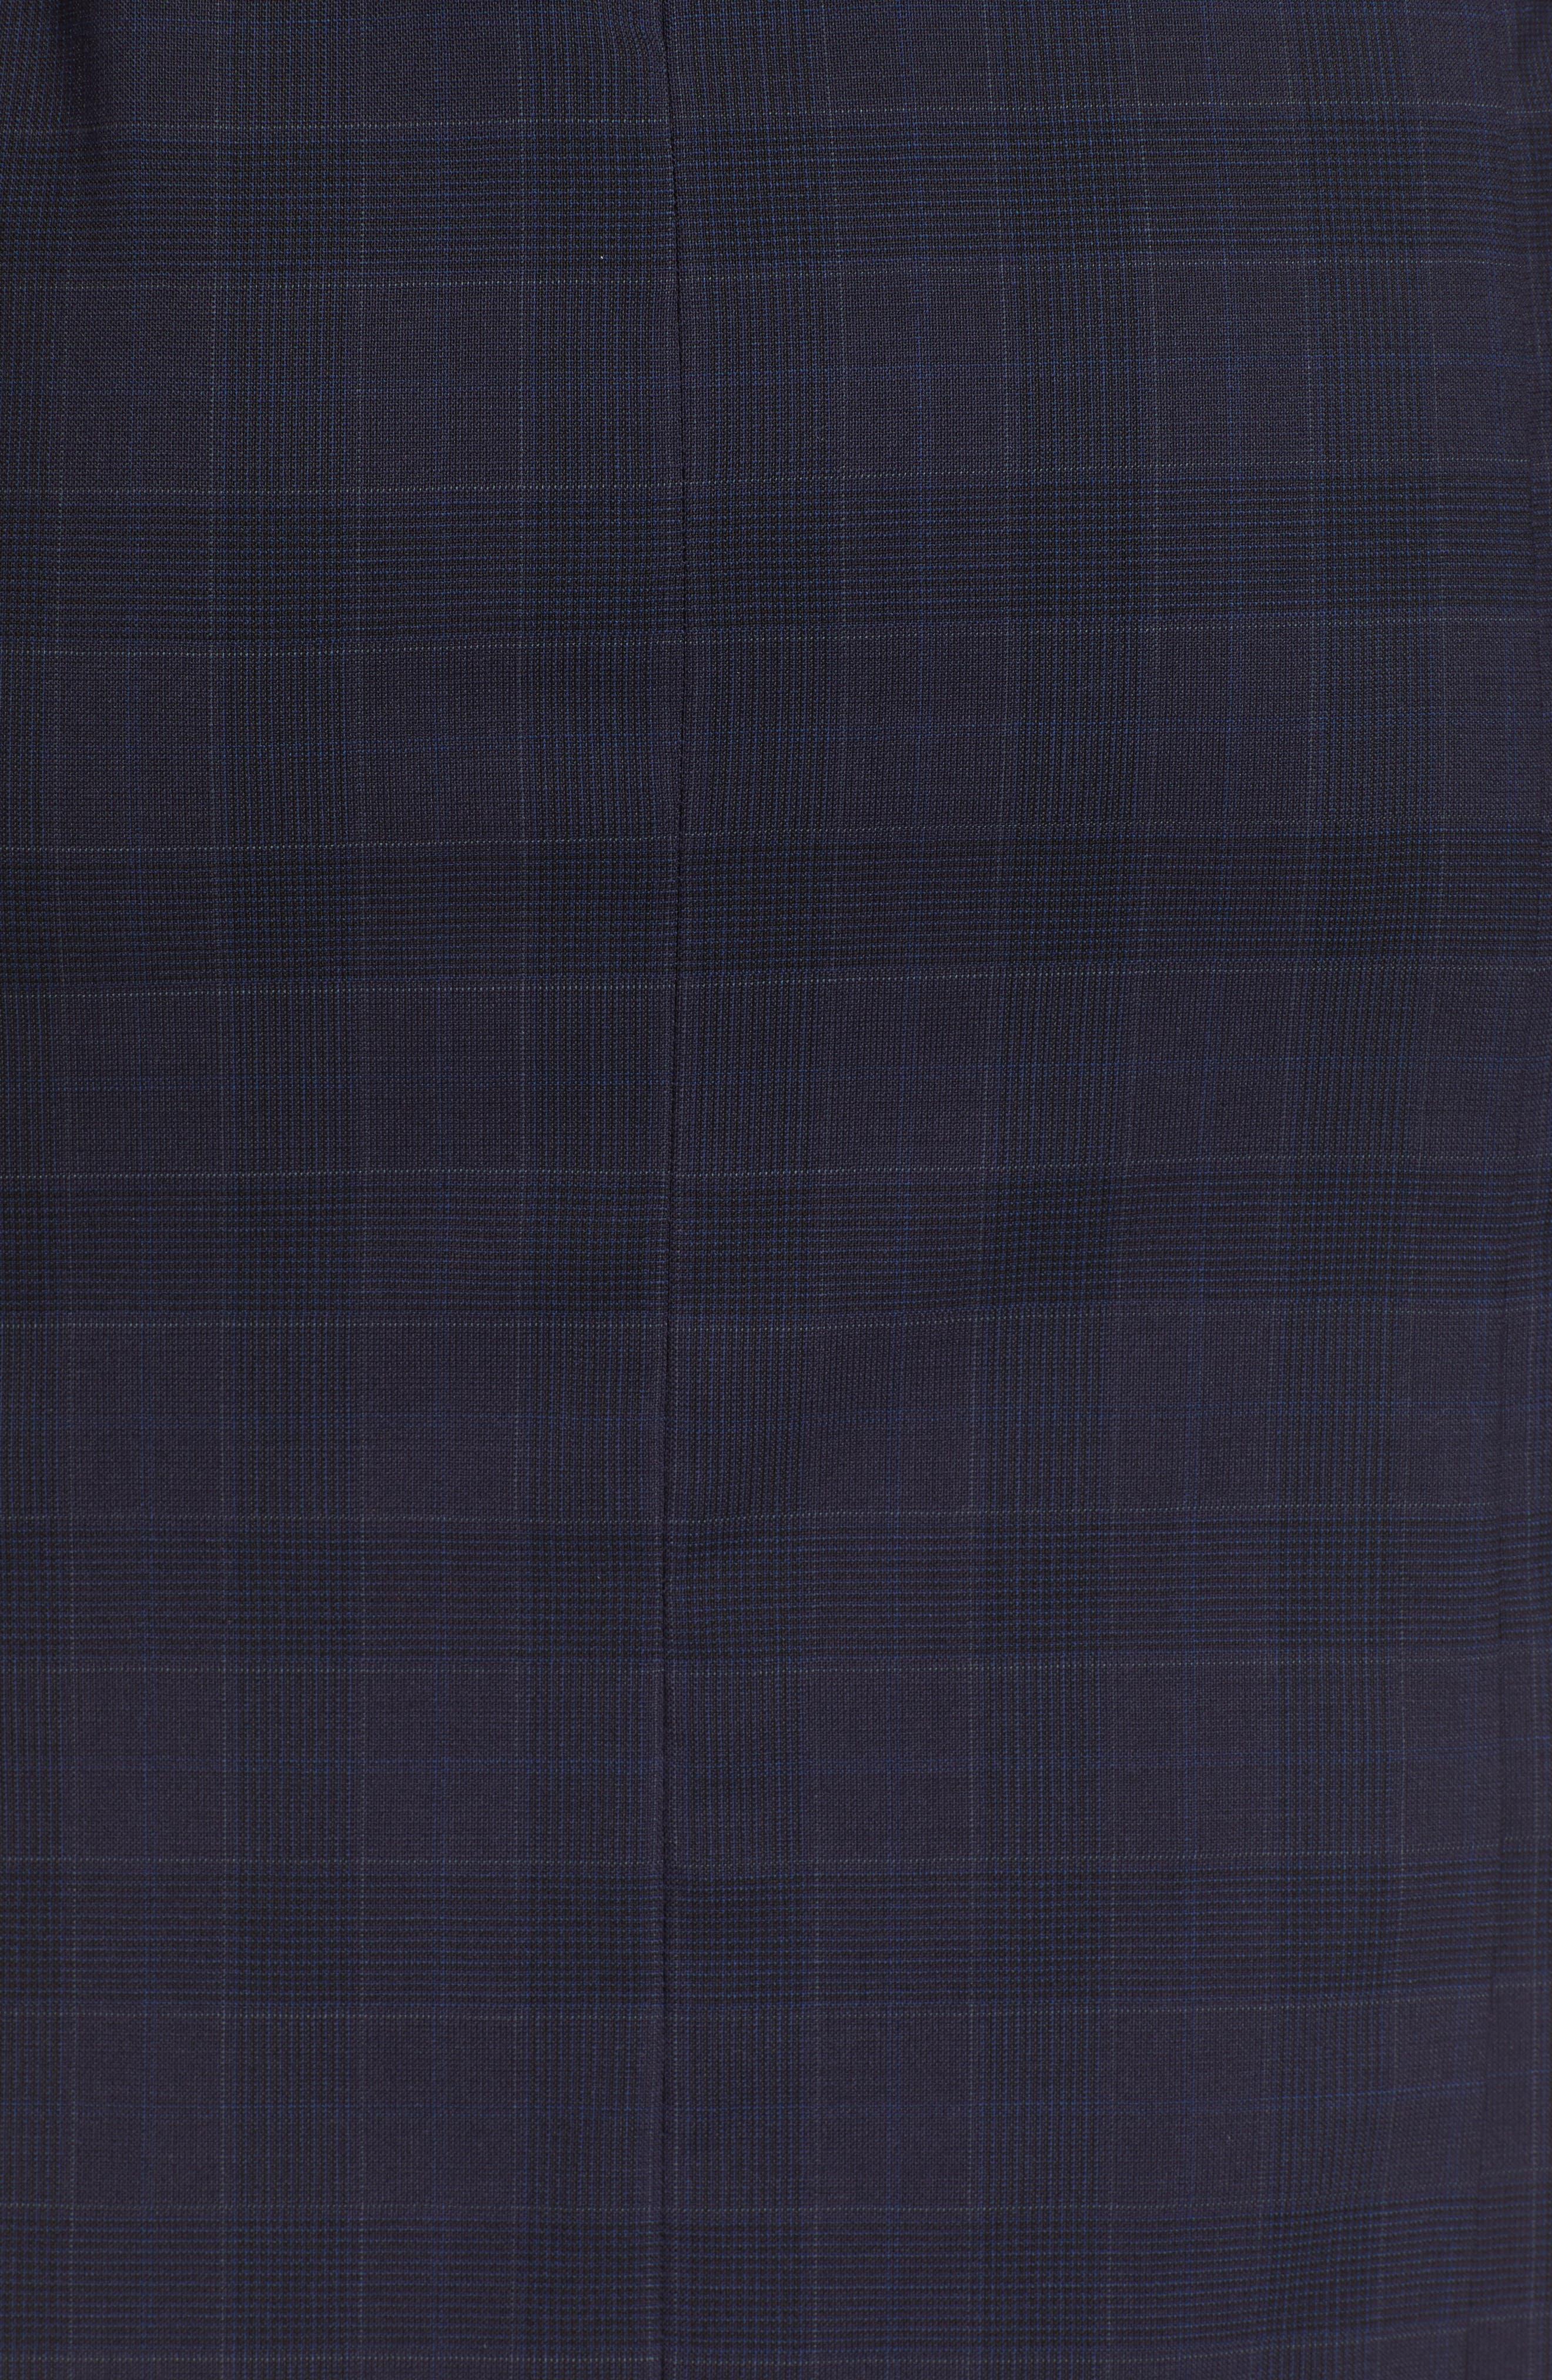 BOSS, Docanes Modern Check Wool Dress, Alternate thumbnail 6, color, DARK NAVY FANTASY